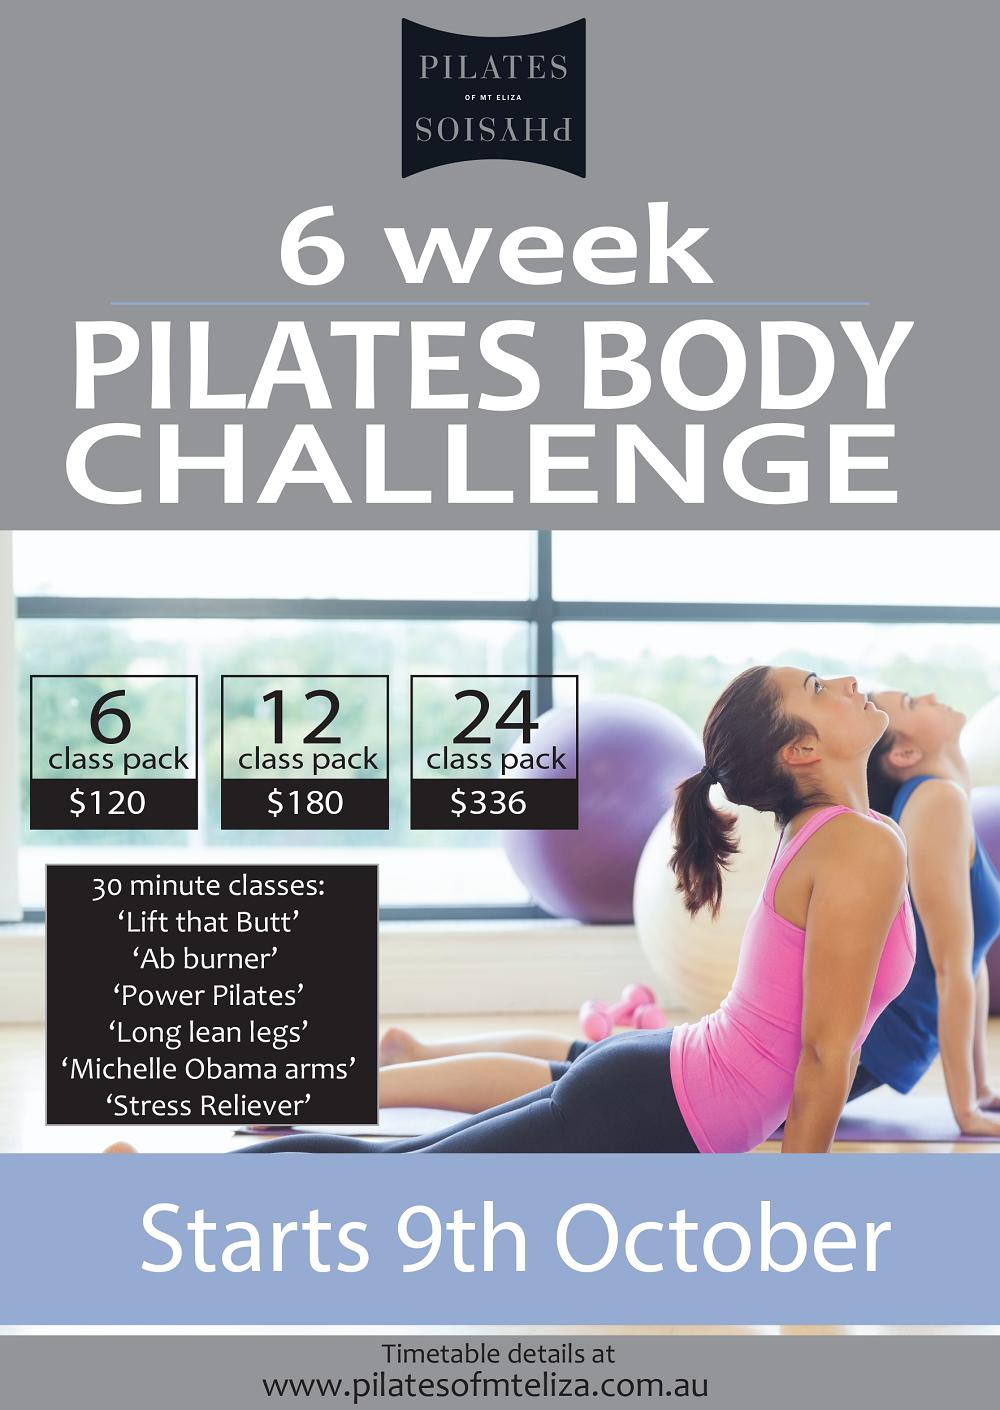 POM 6 week body challenge image (1).png